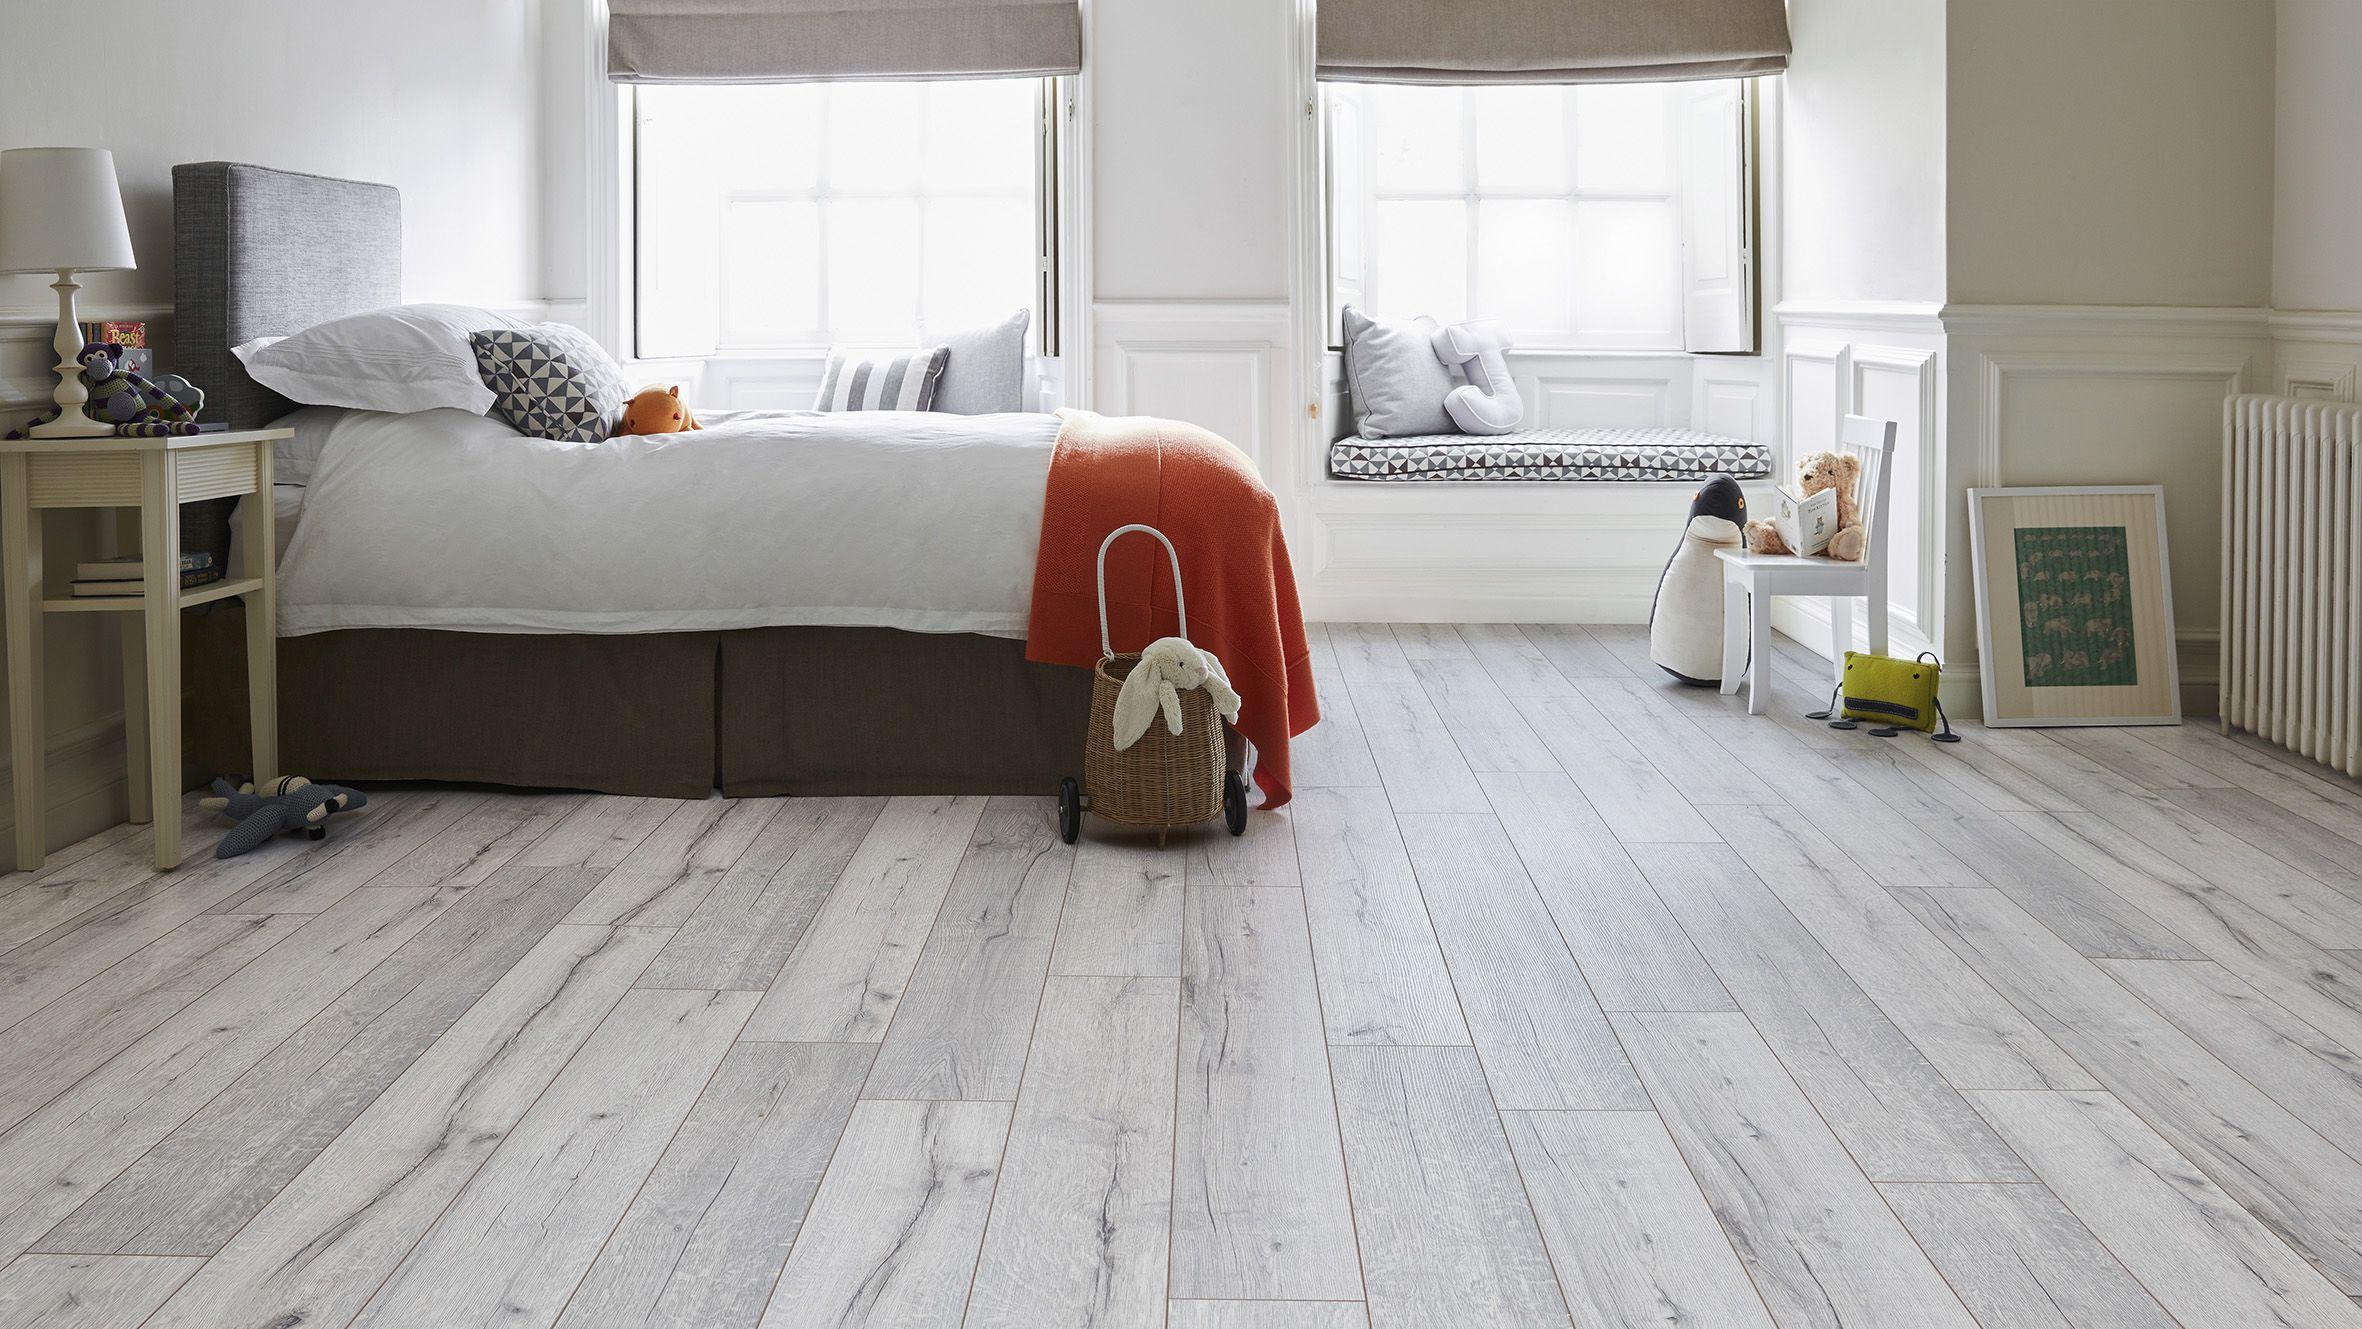 46 Beautiful Bedroom Decorating Ideas Bedroom Laminate Flooring White Laminate Flooring Best Laminate